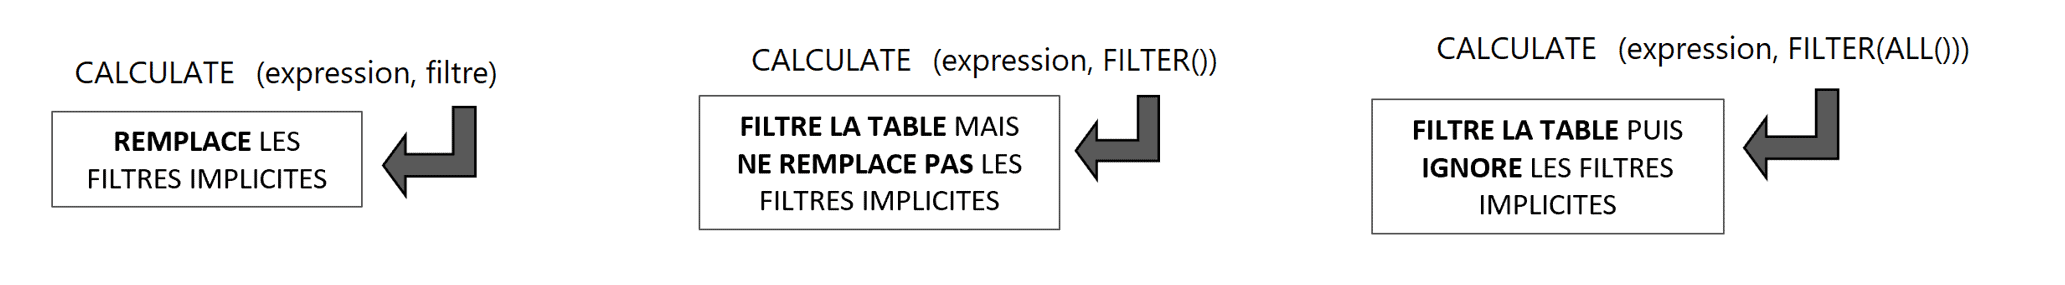 Filtres explicites en langage DAX